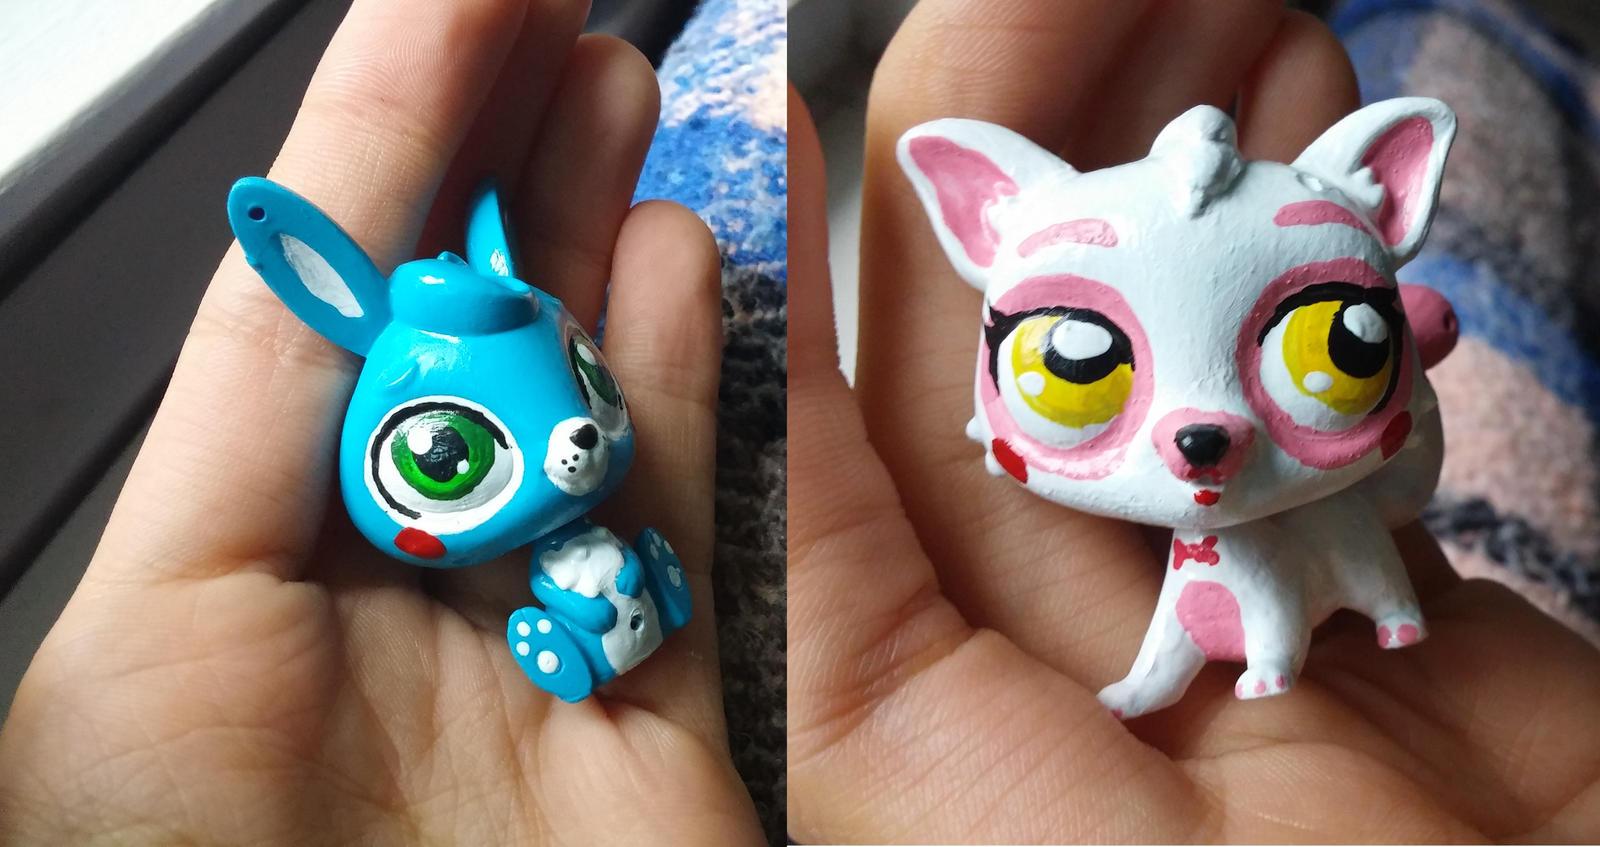 Toy bonnie and toy foxy by kibaandme on deviantart